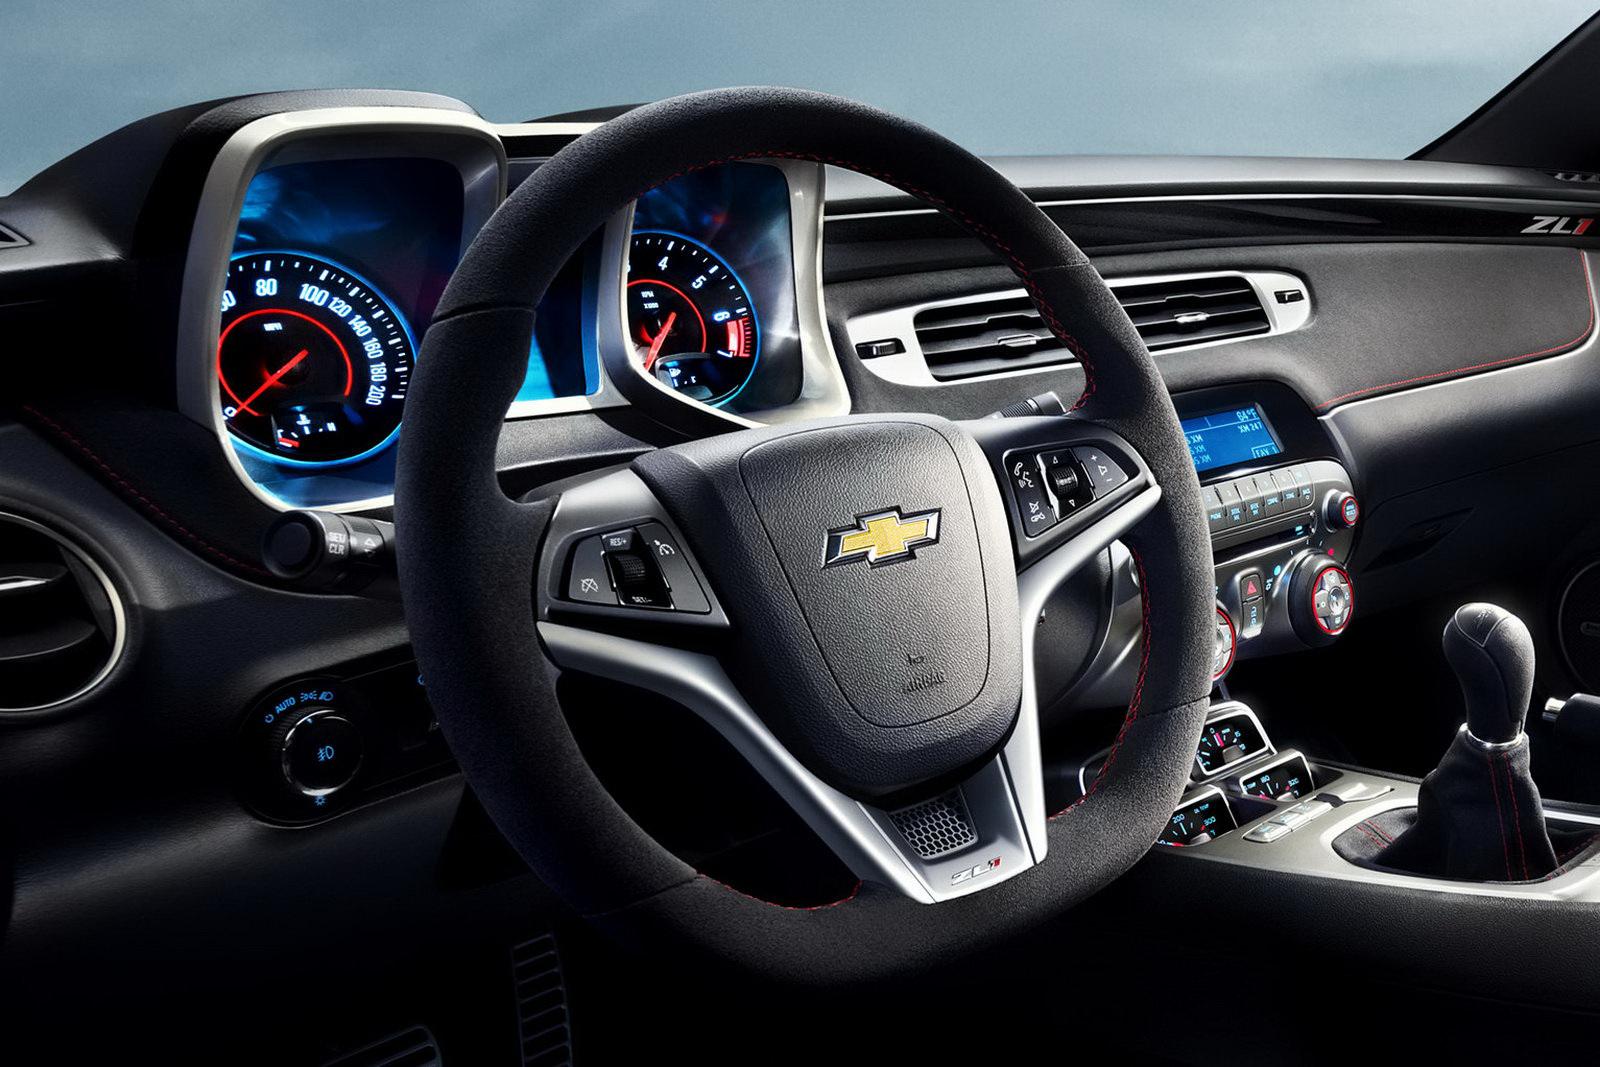 New 2012 Chevrolet Camaro ZL1